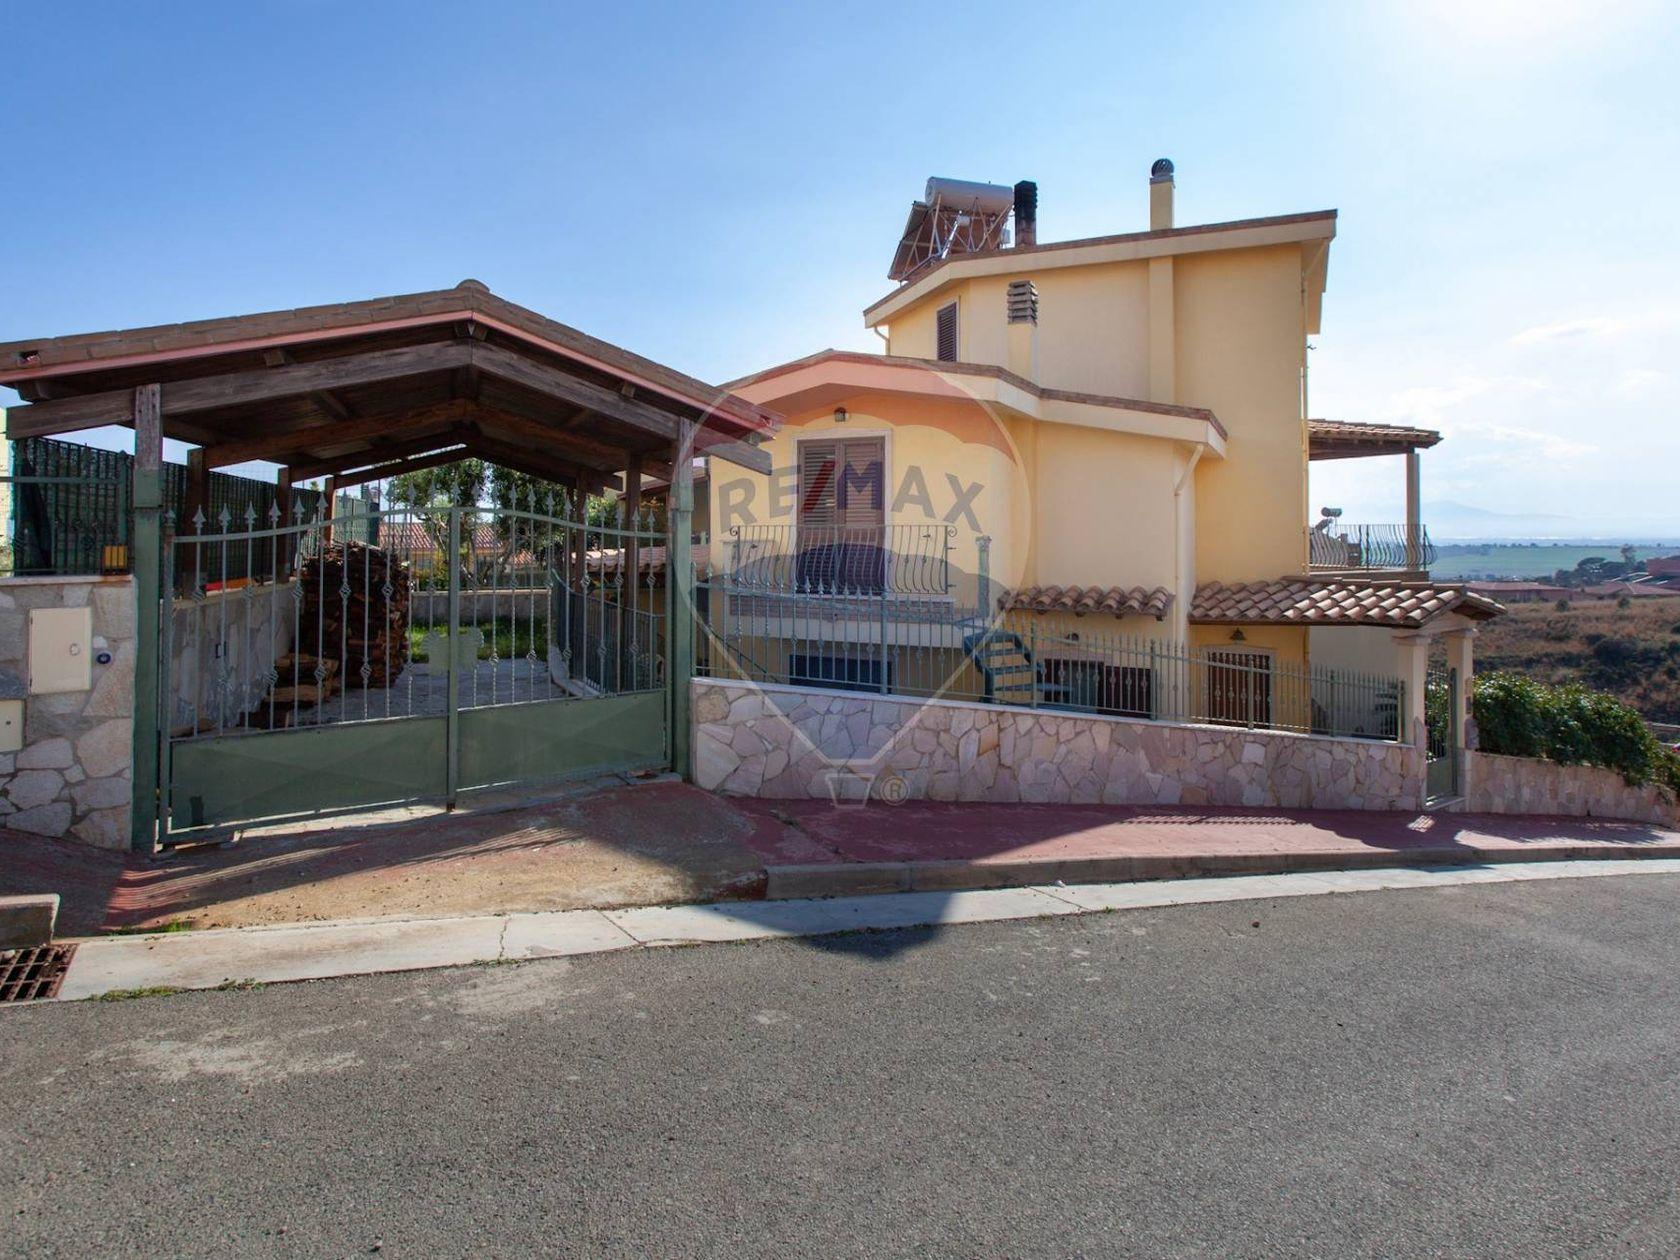 Villetta bifamiliare Sinnai-zona Centro, Sinnai, CA Vendita - Foto 3